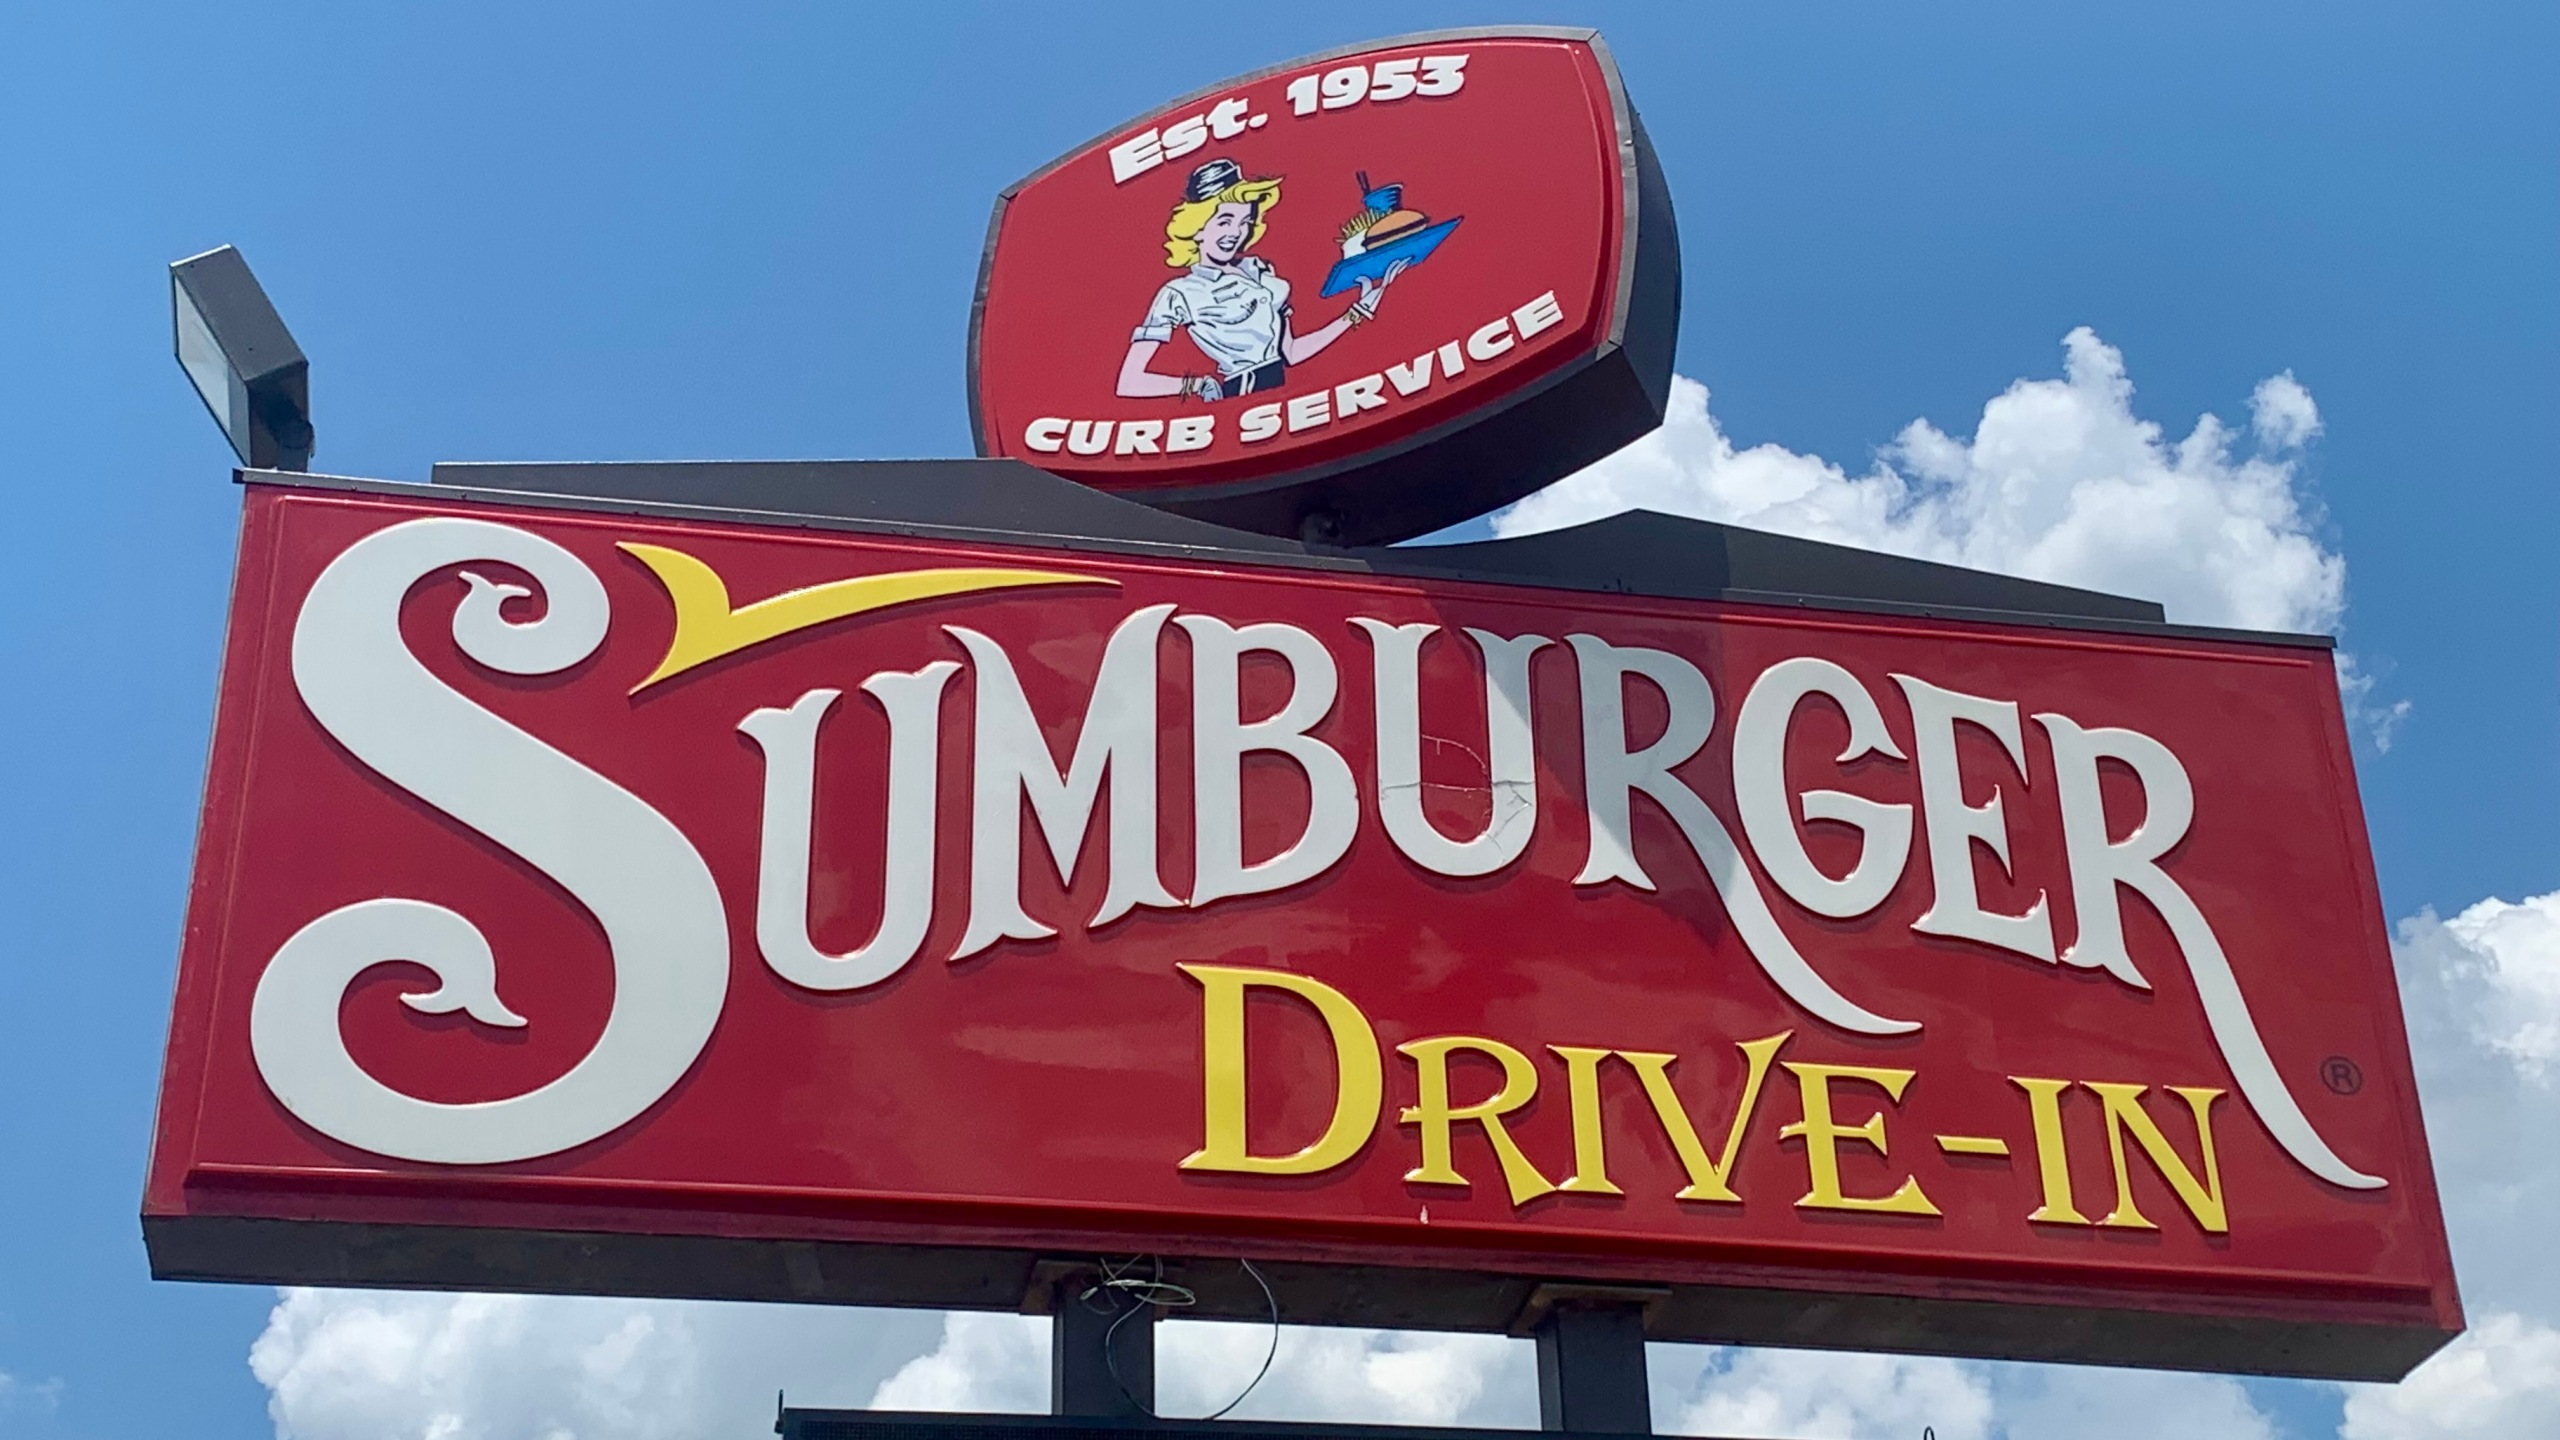 Sumburger Drive-In